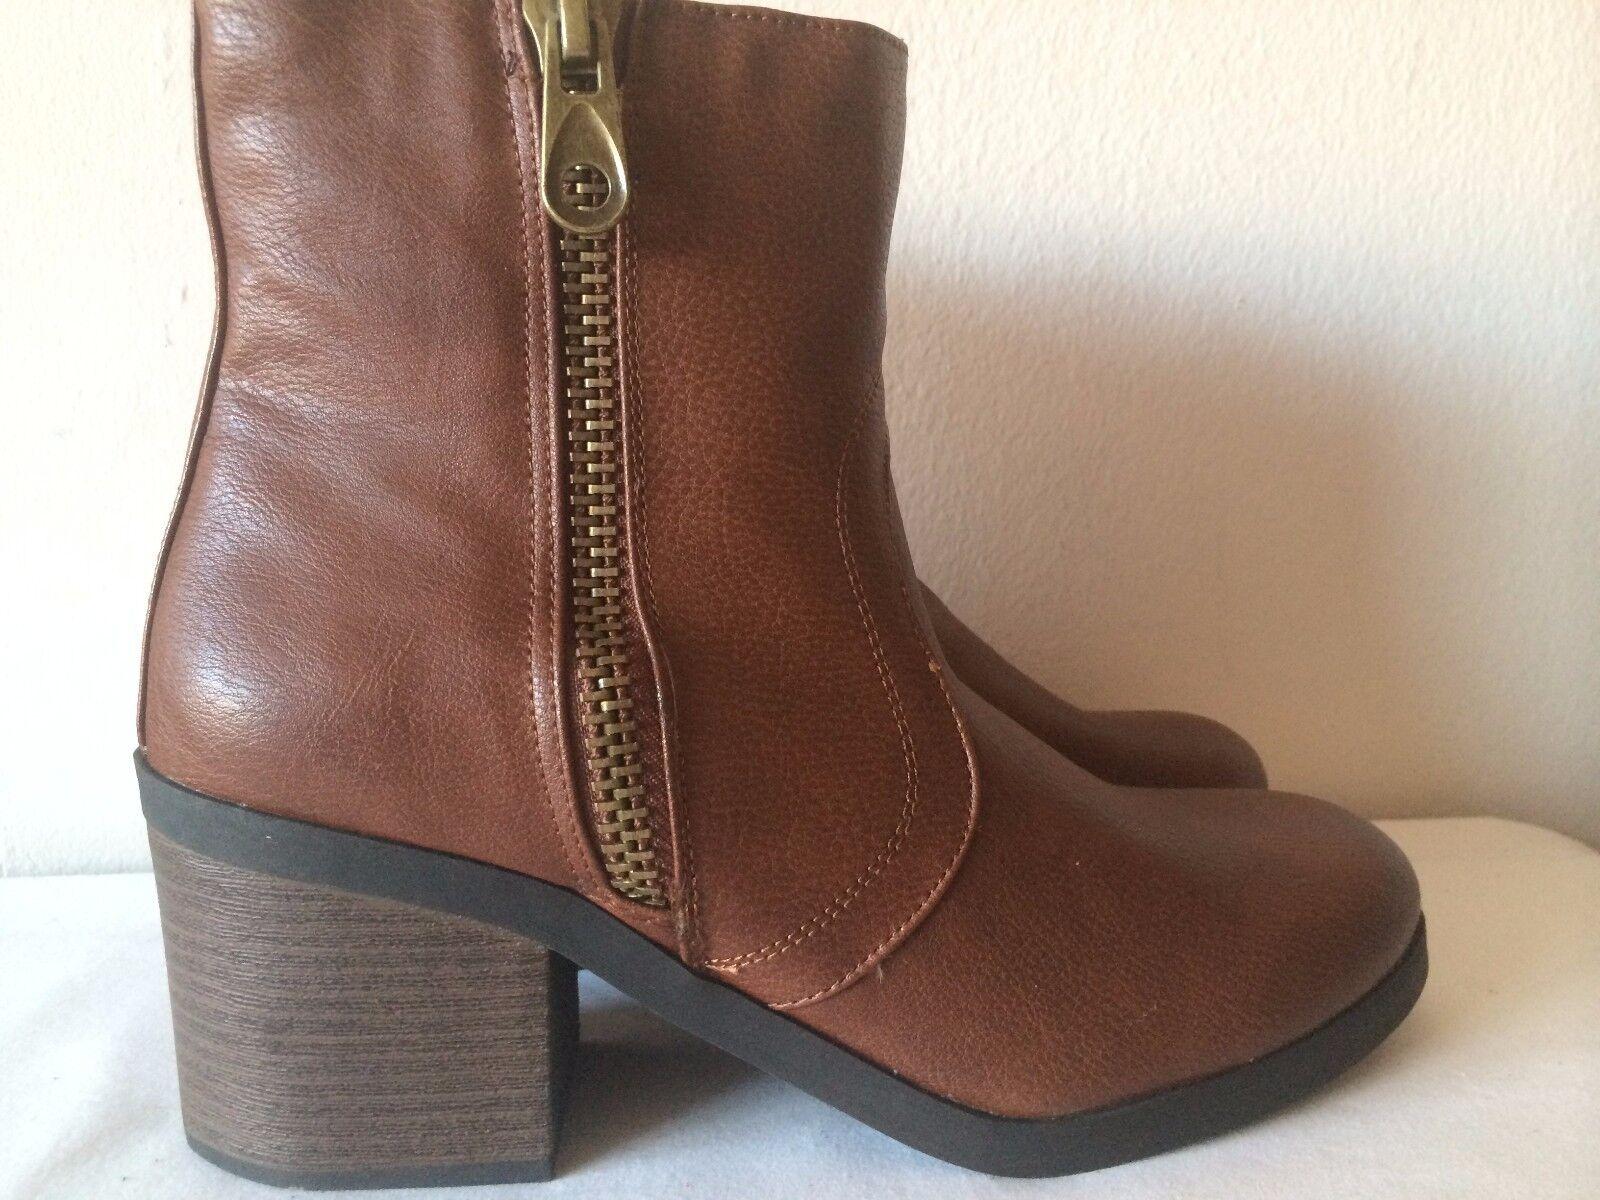 Guess Aubry women's boots New